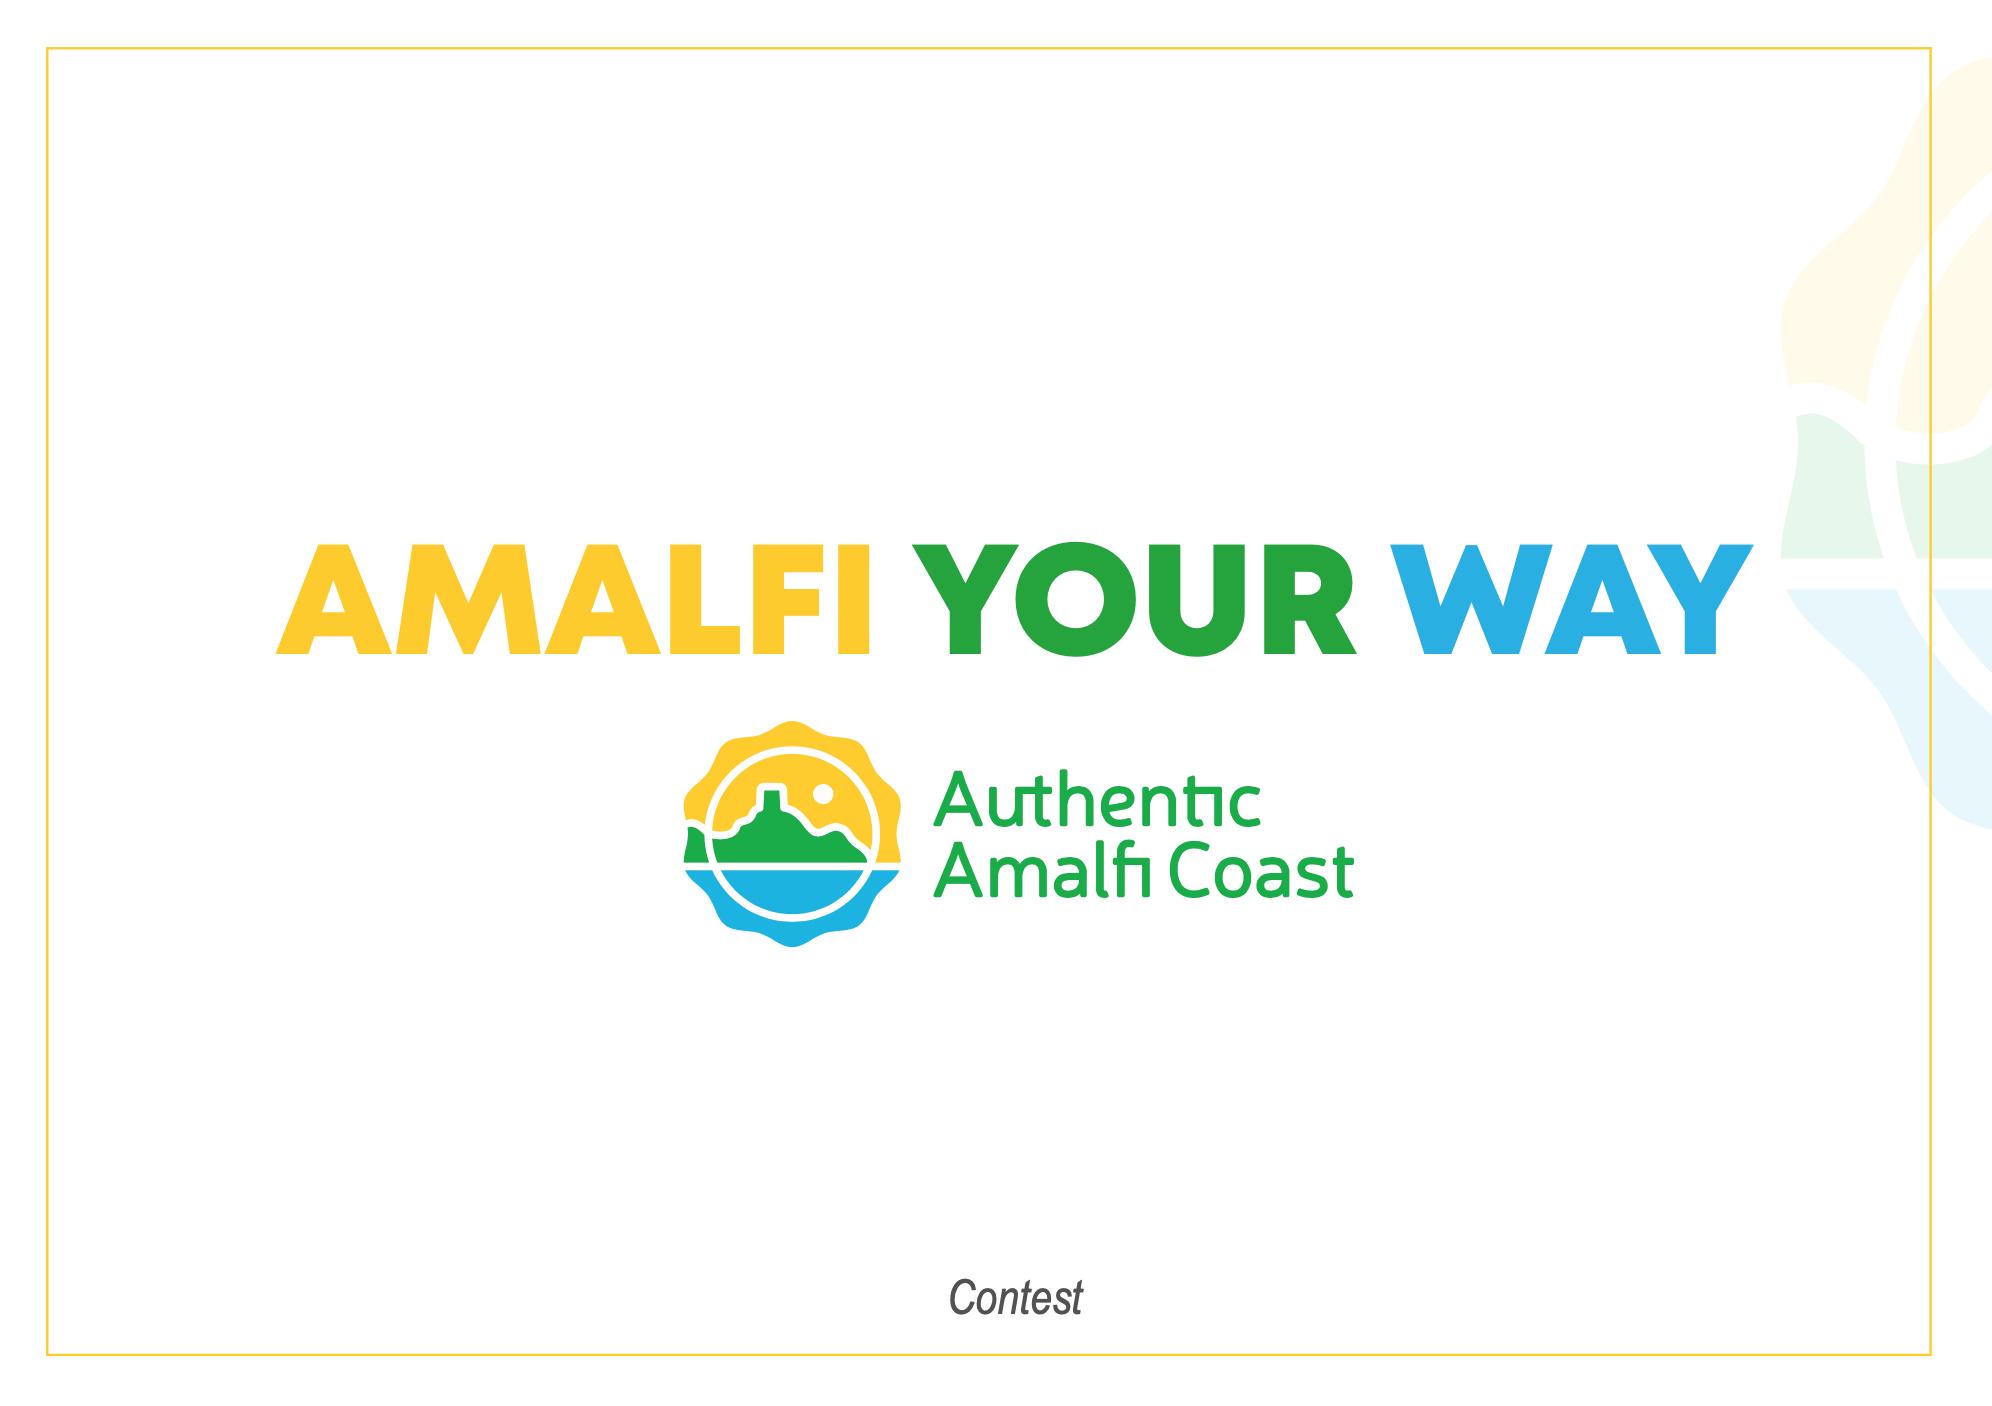 Amalfi-your-way-contest